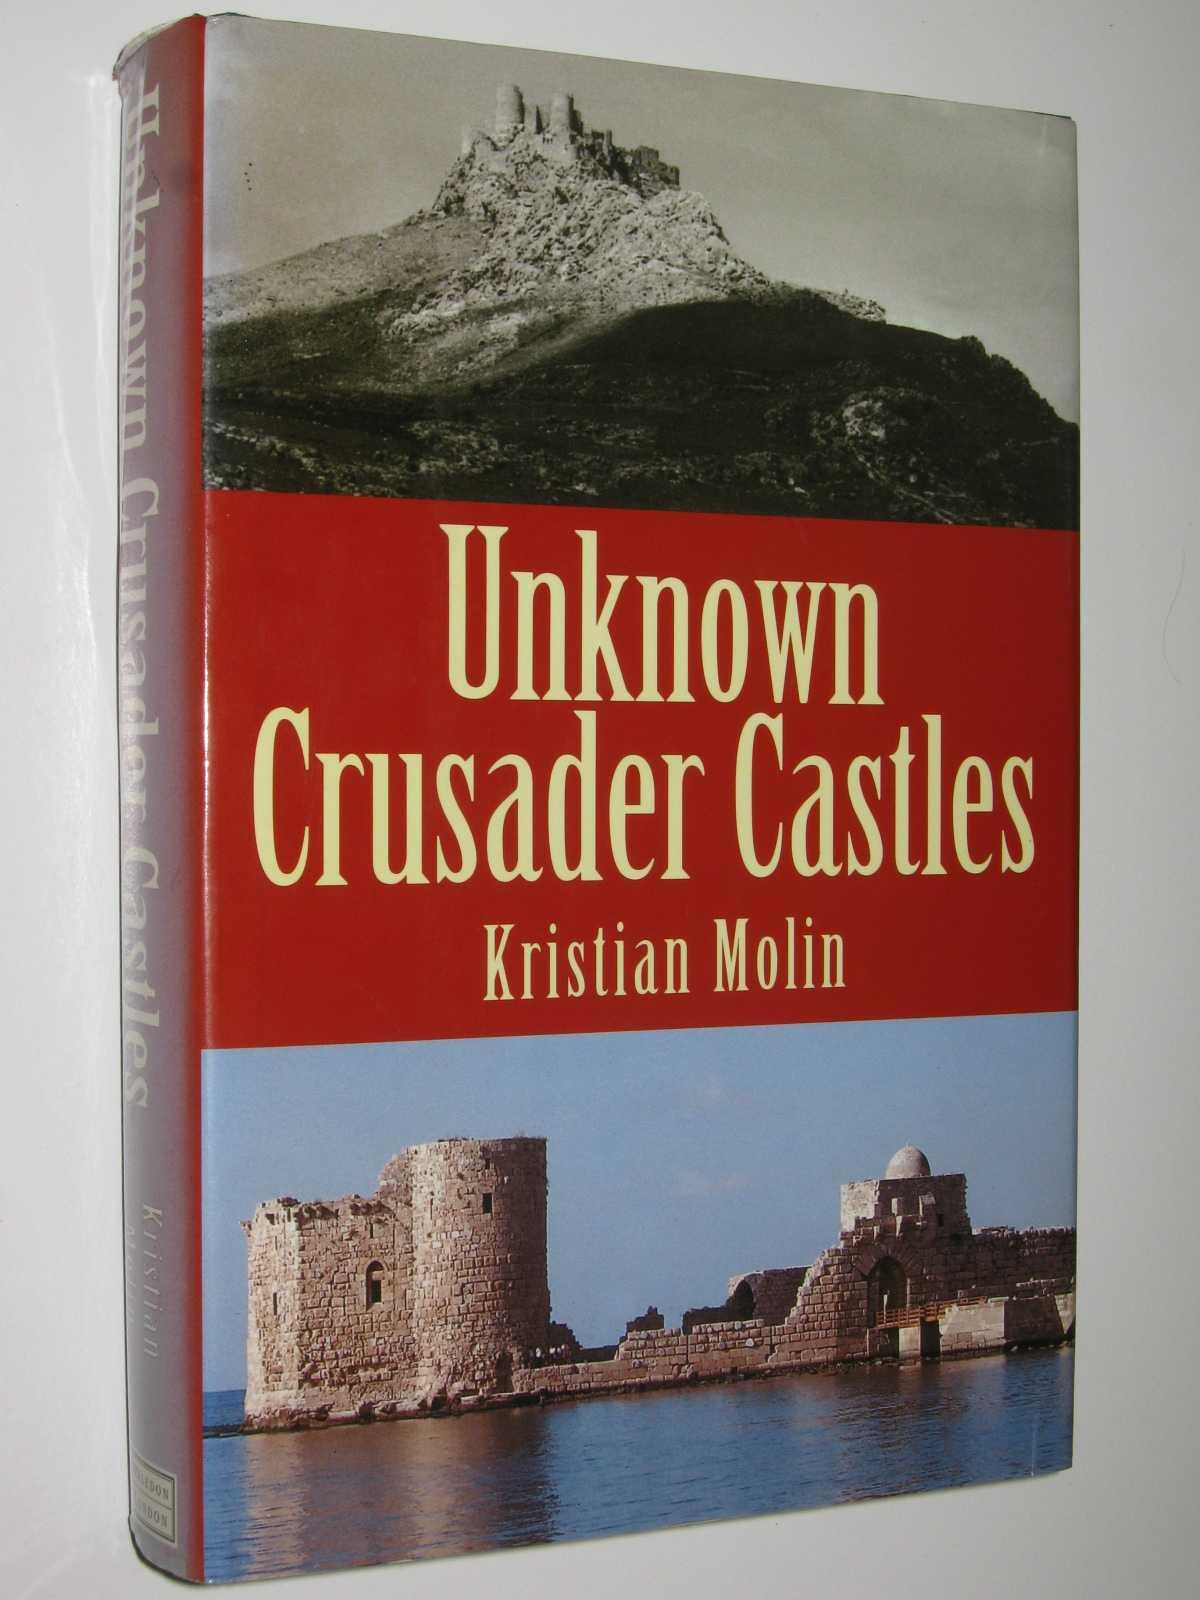 Unknown Crusader Castles, Molin, Kristian